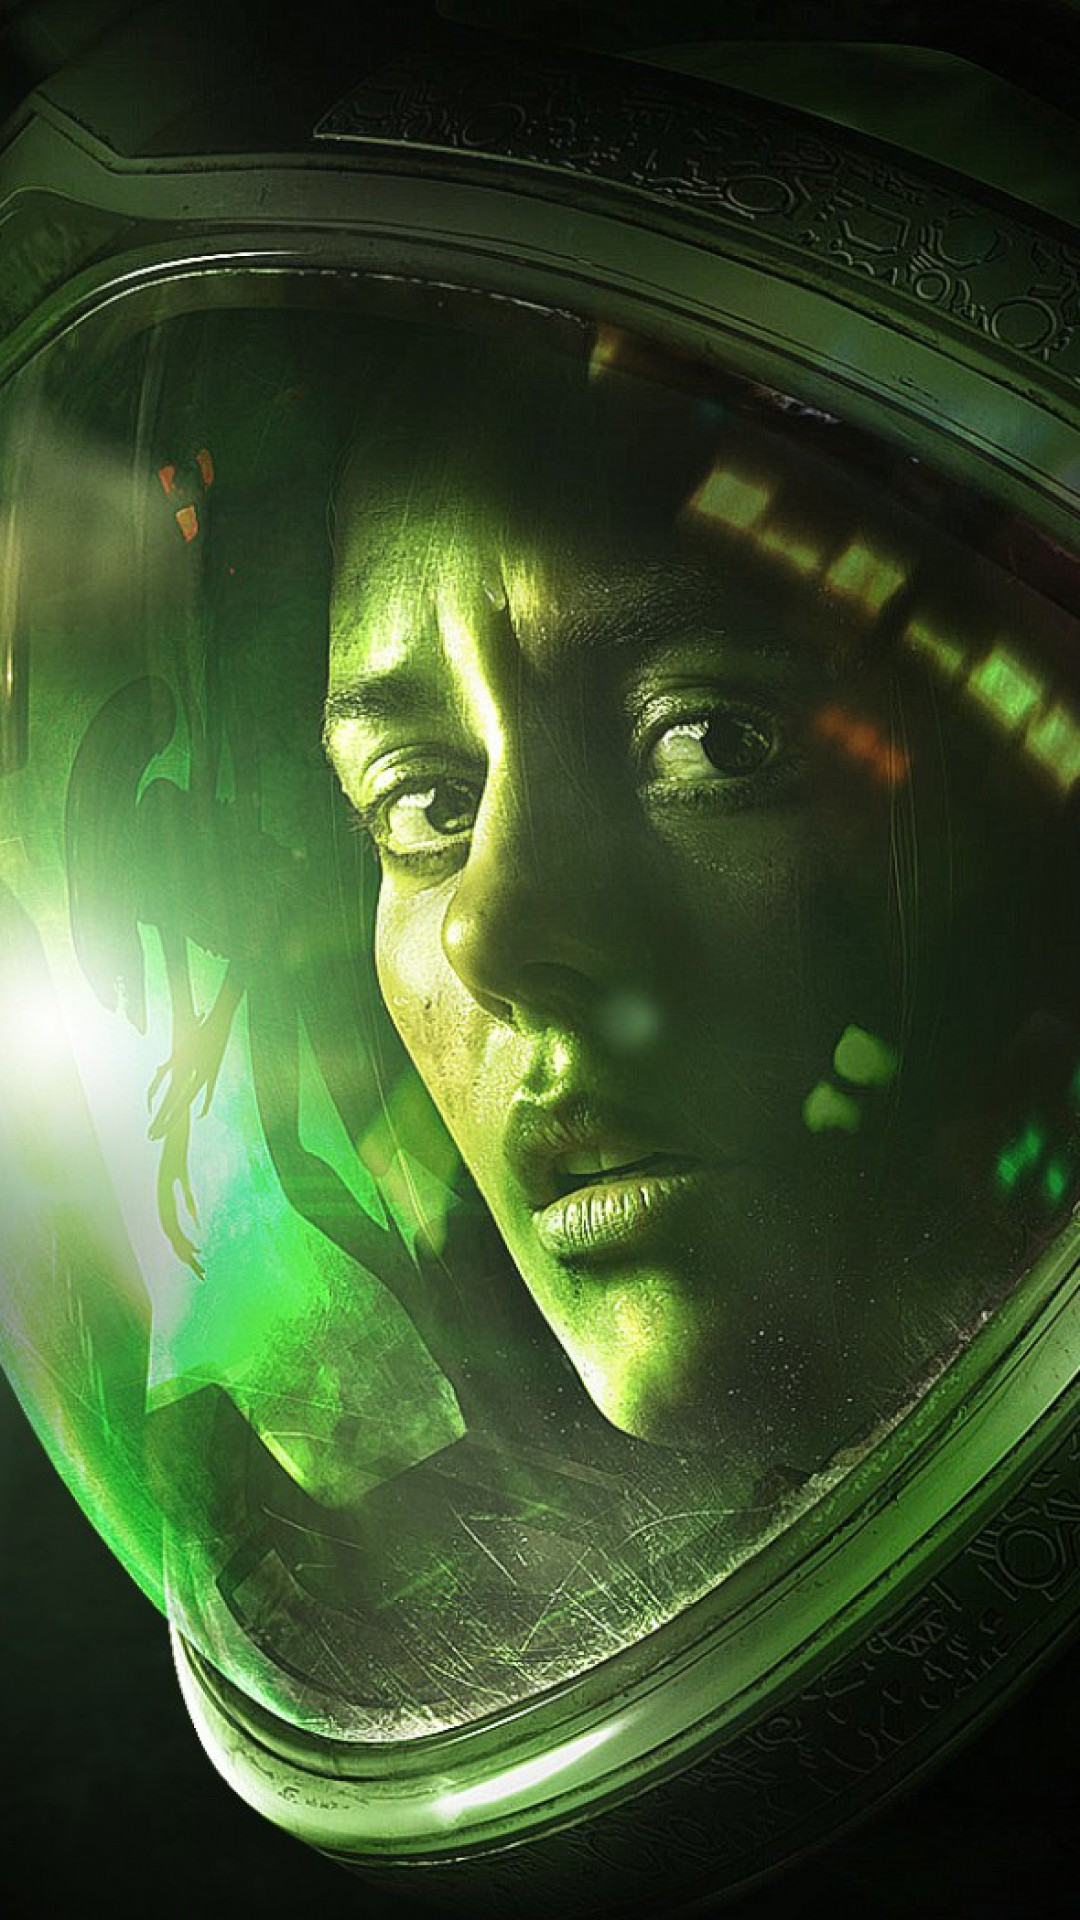 Preview wallpaper alien isolation, game, 2014, ellen ripley, girl 1080×1920